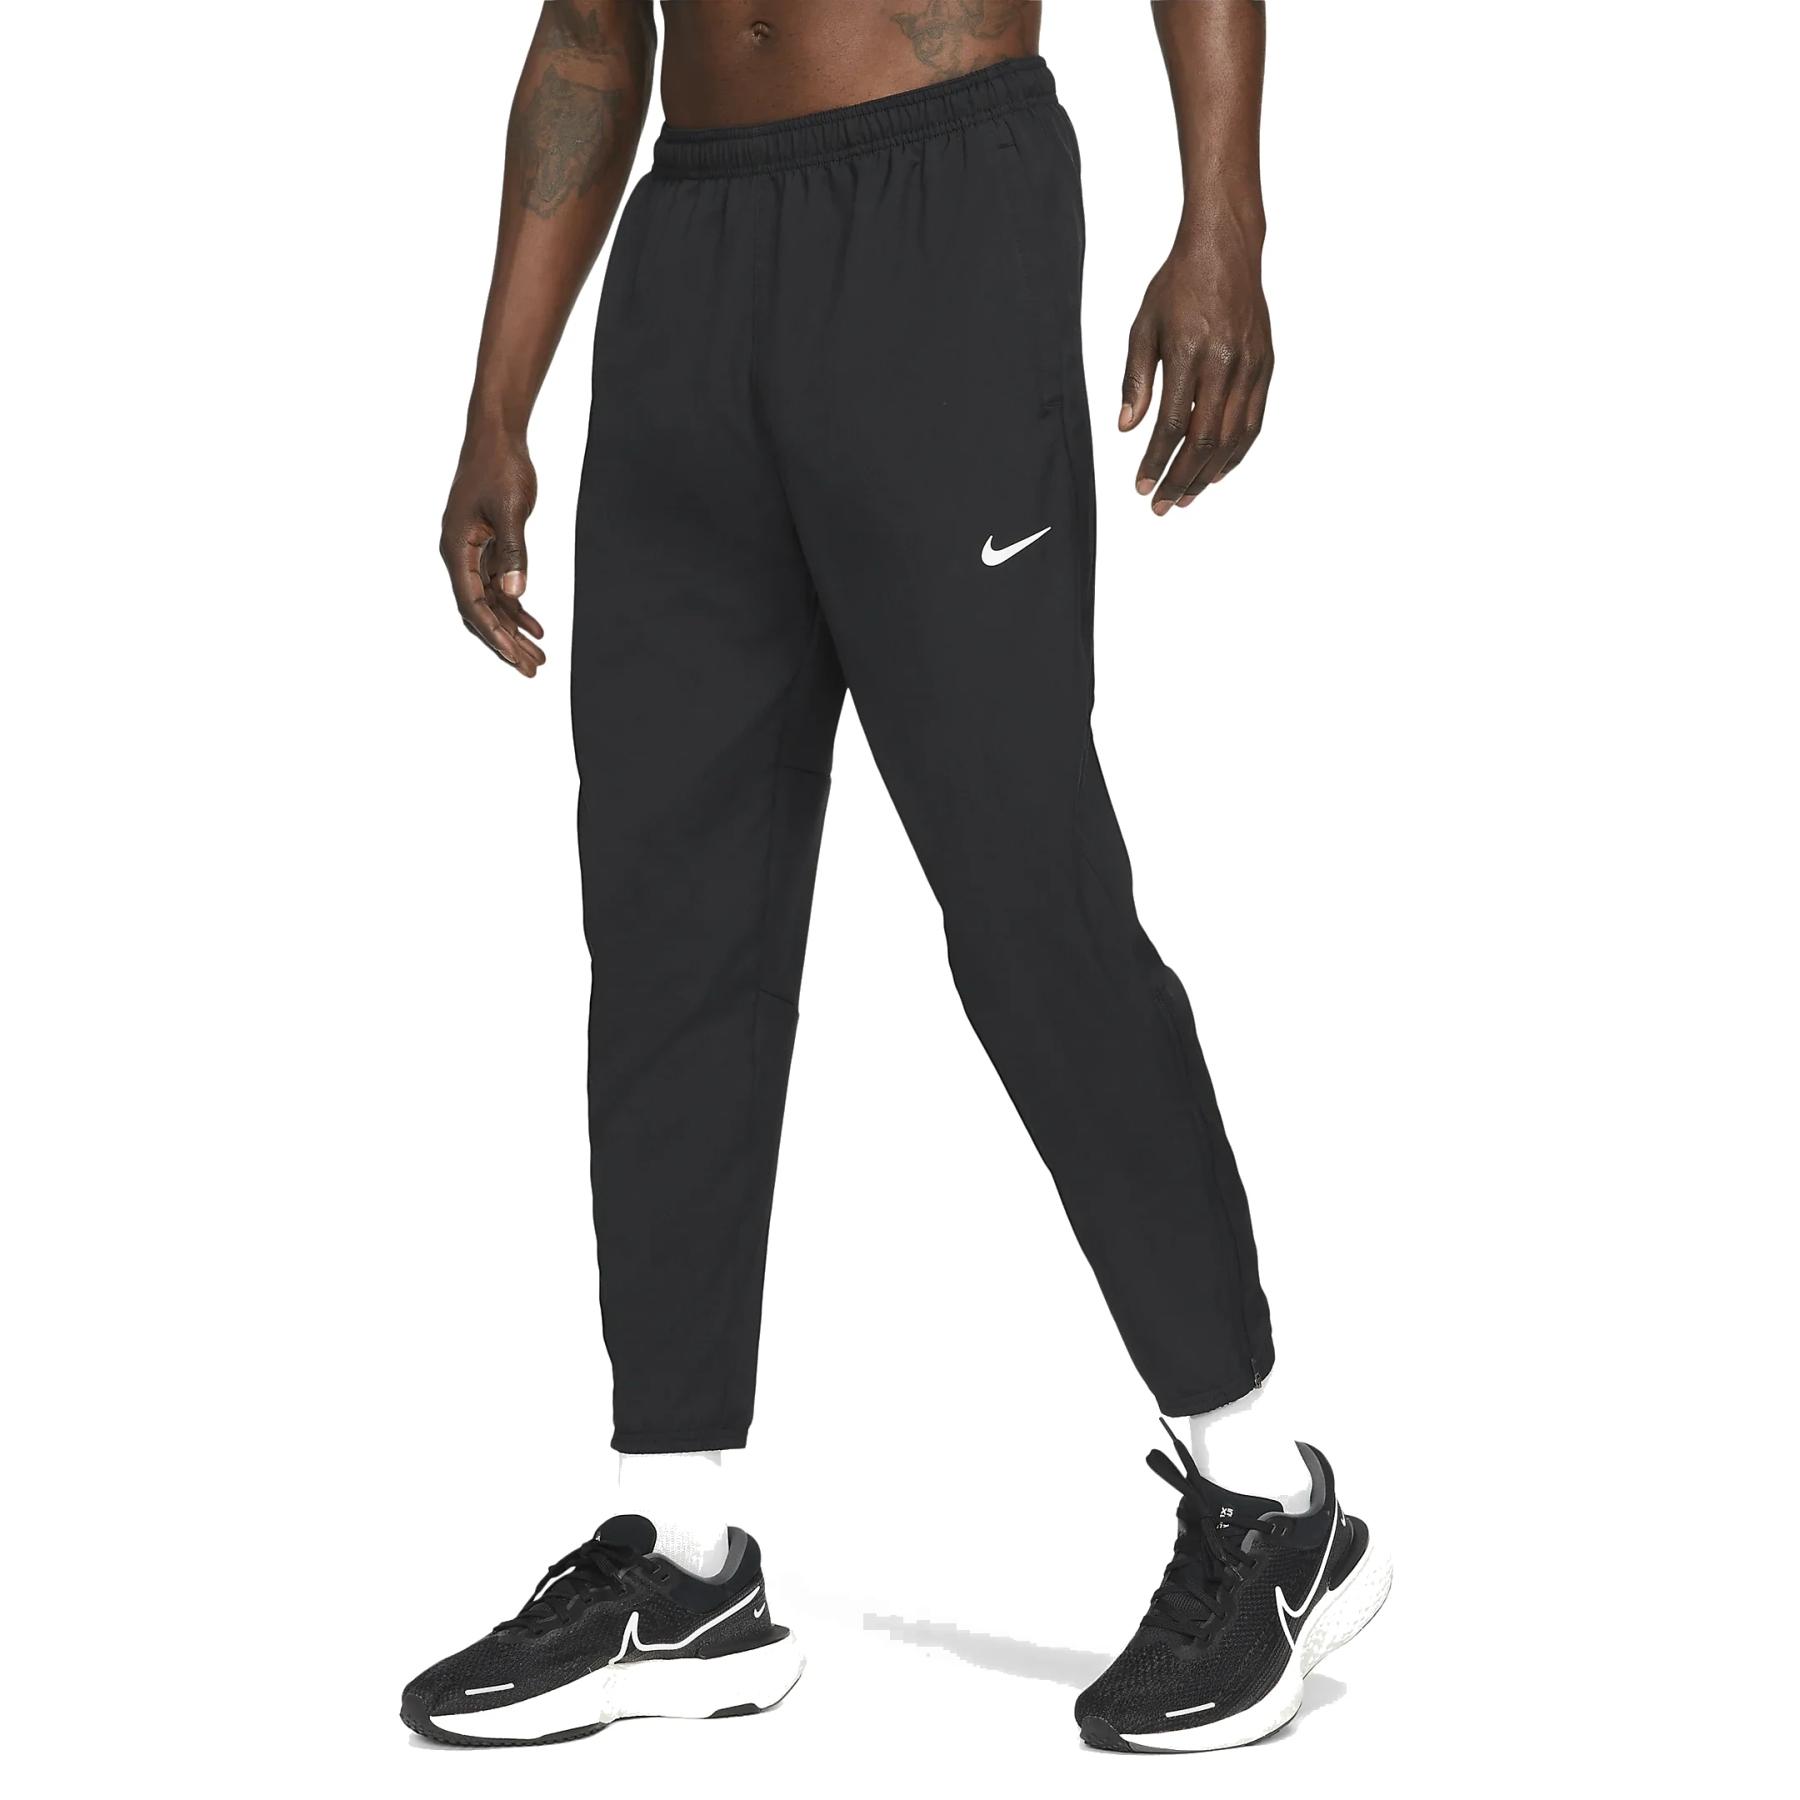 Nike Dri-FIT Challenger Pantalon de Correr para Hombre - black/reflective silver DD4894-010